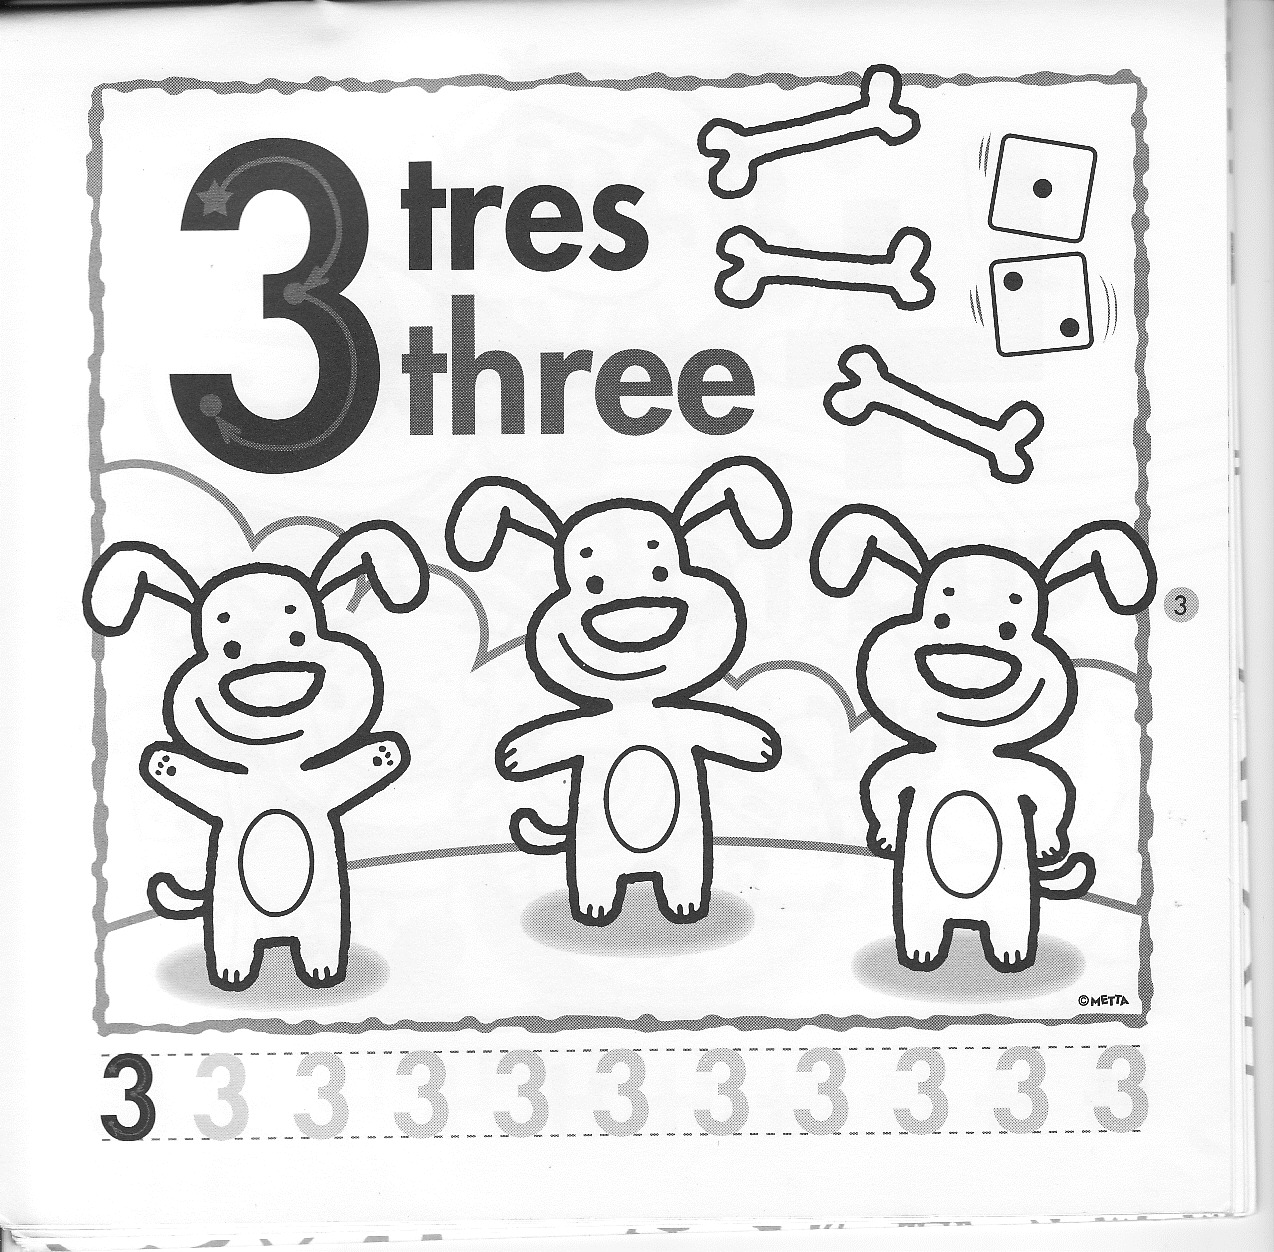 Fichas de números en inglés